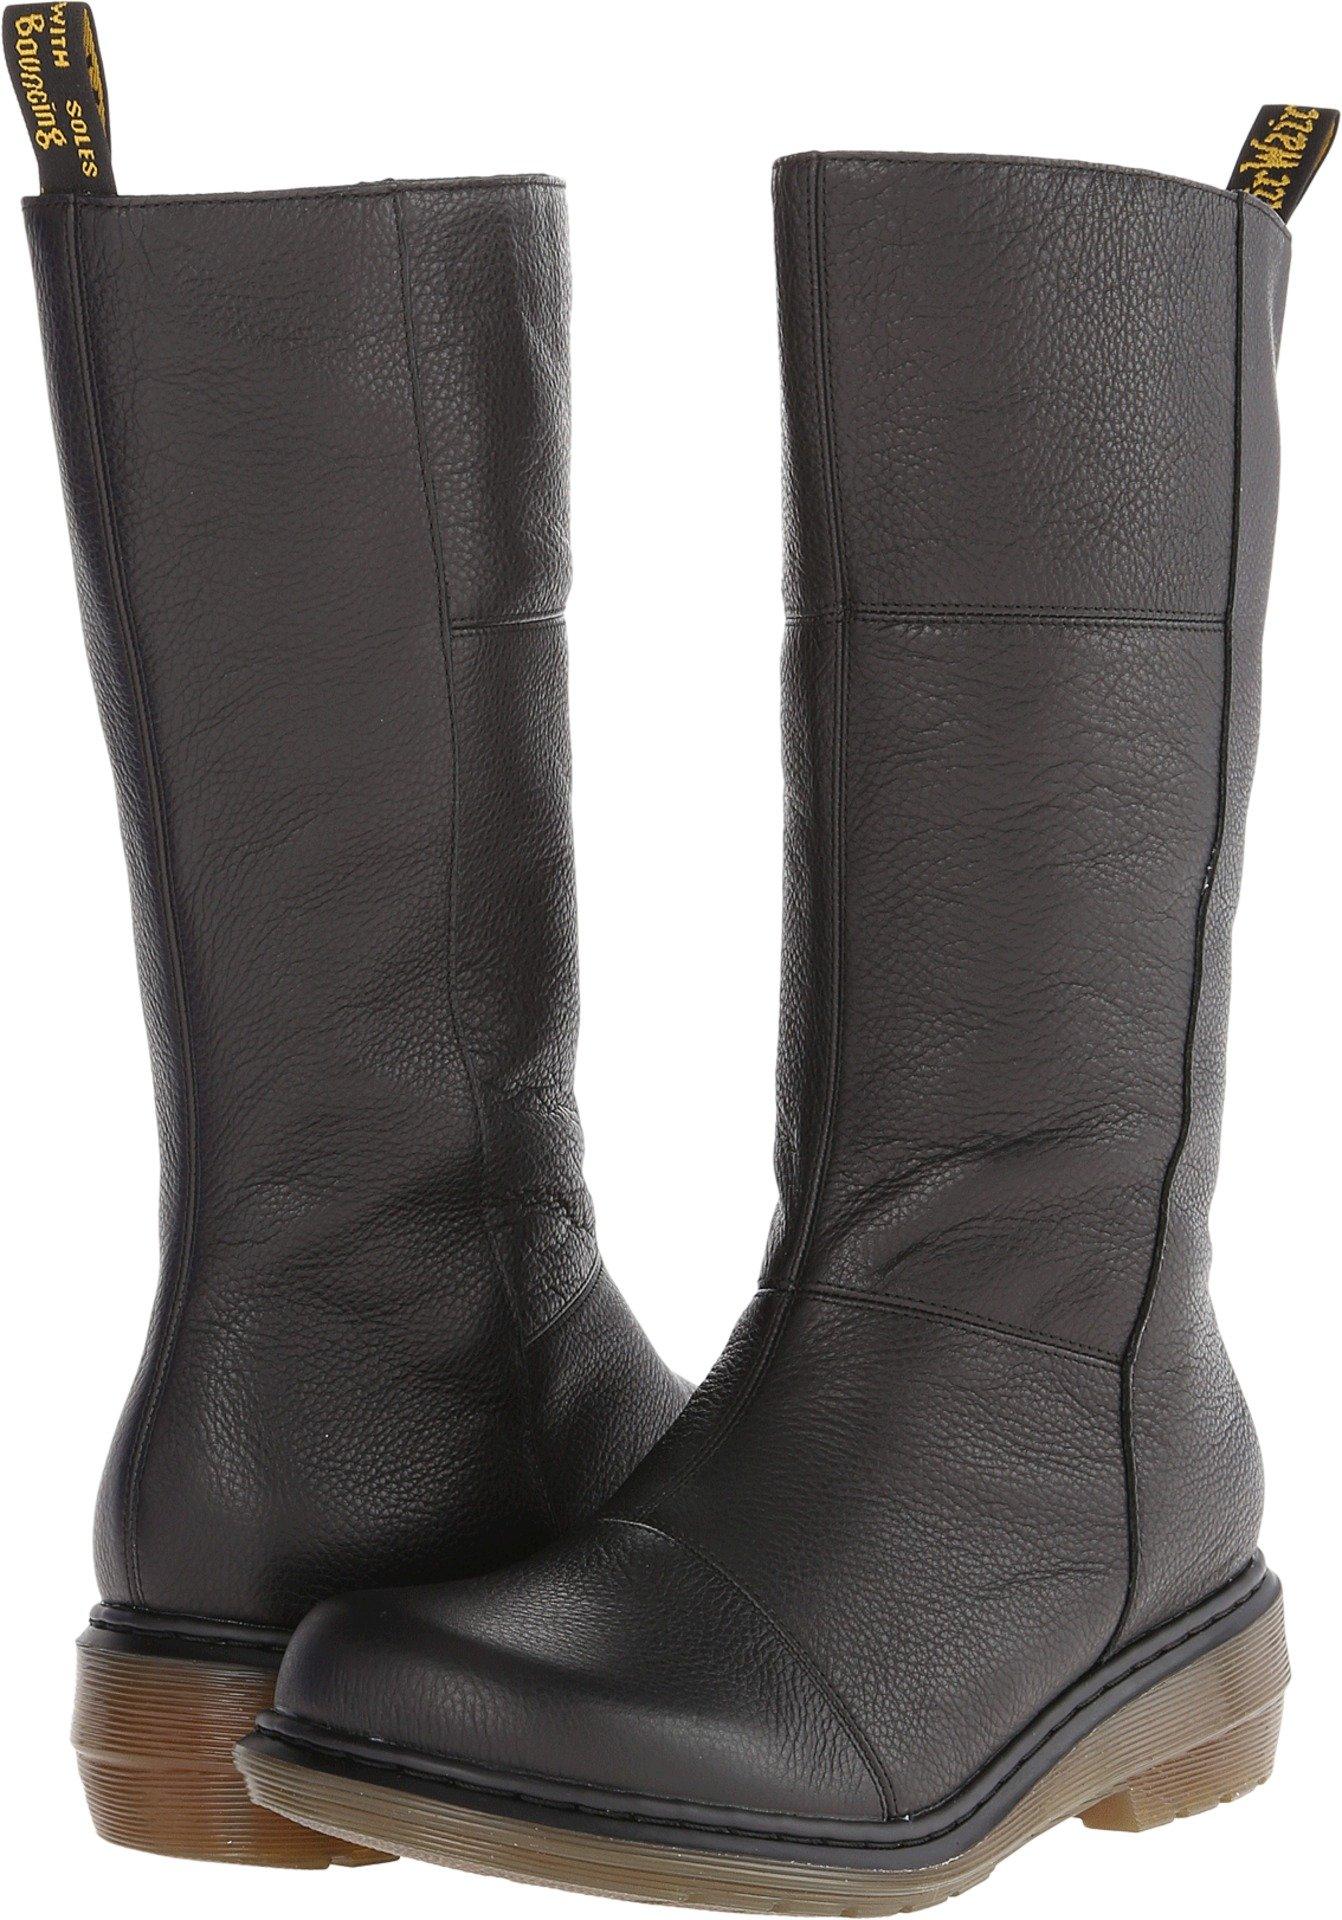 Dr. Martens Women's Charla Tall Zip Boot,Black Broadway,9 UK/11 M US